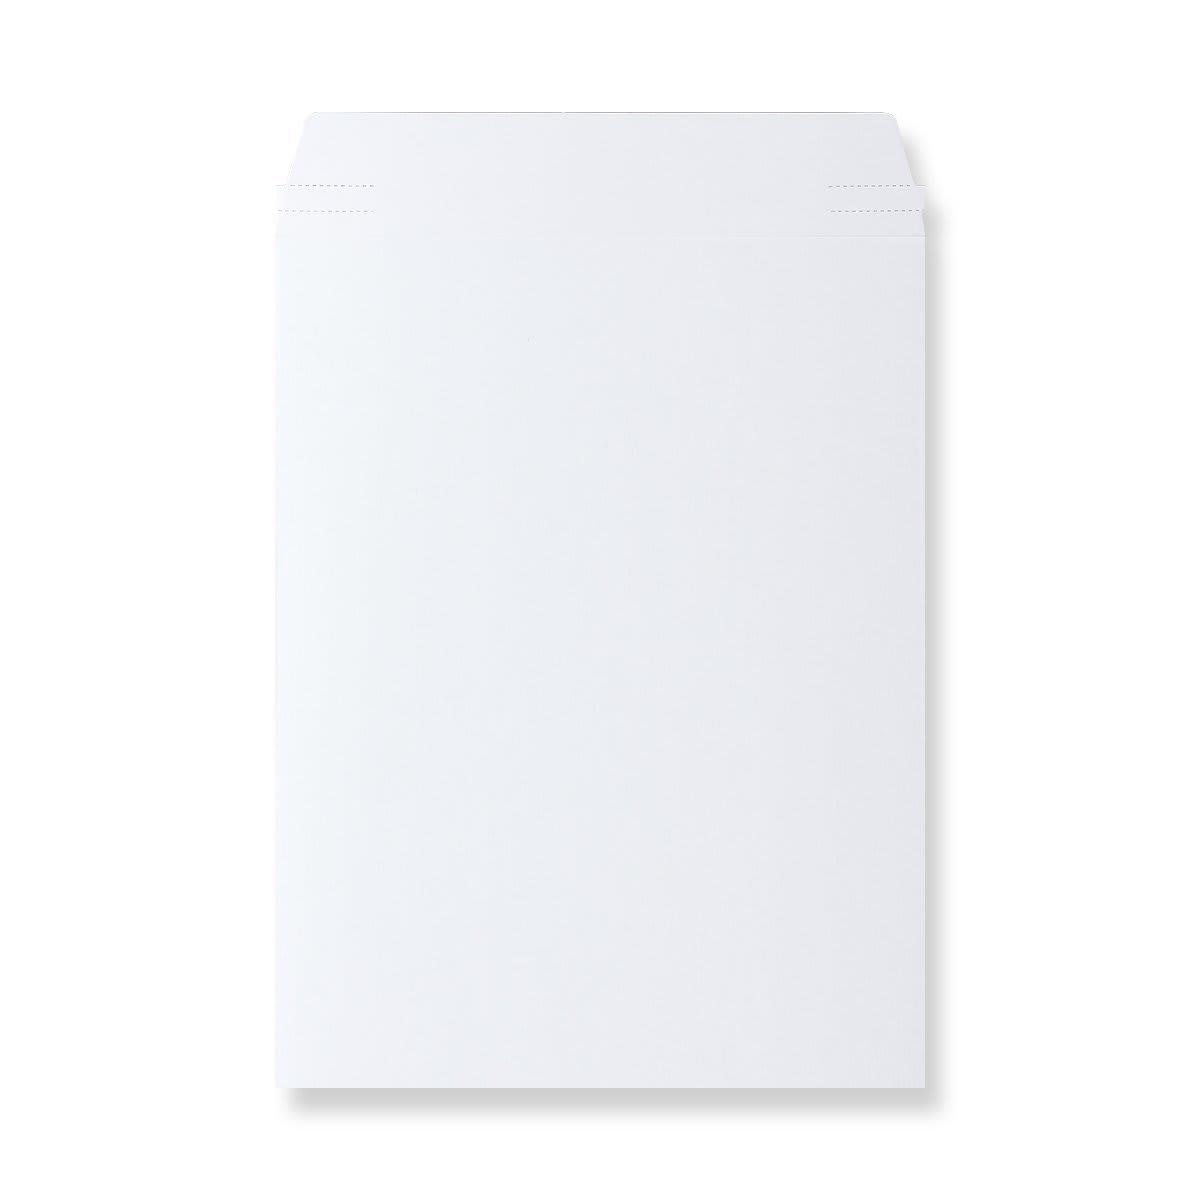 381 x 254mm WHITE ALL BOARD ENVELOPES